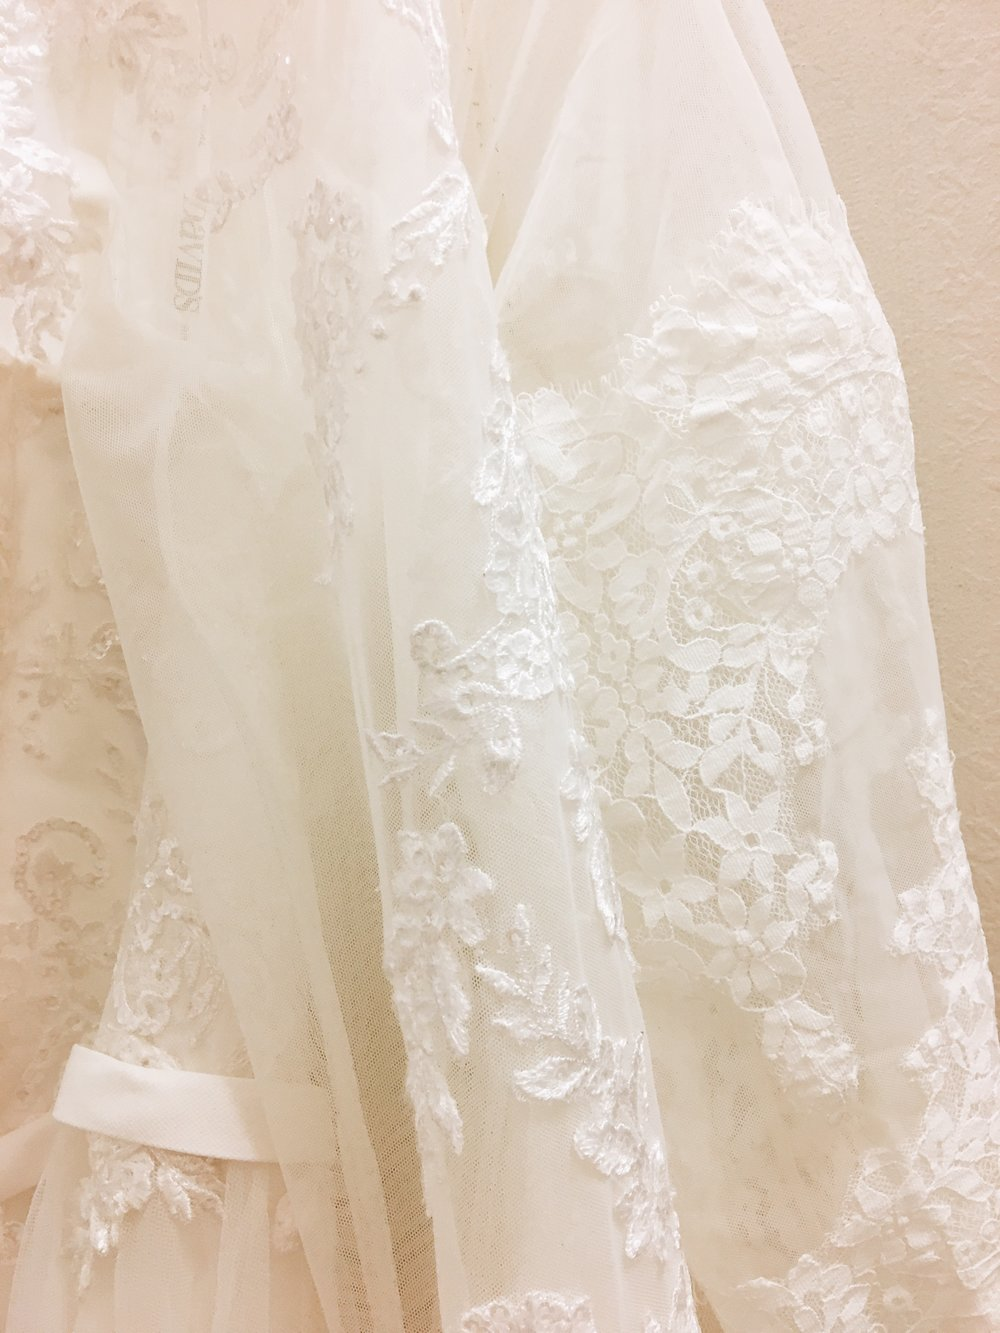 September 6, 2017. I found my wedding dress.